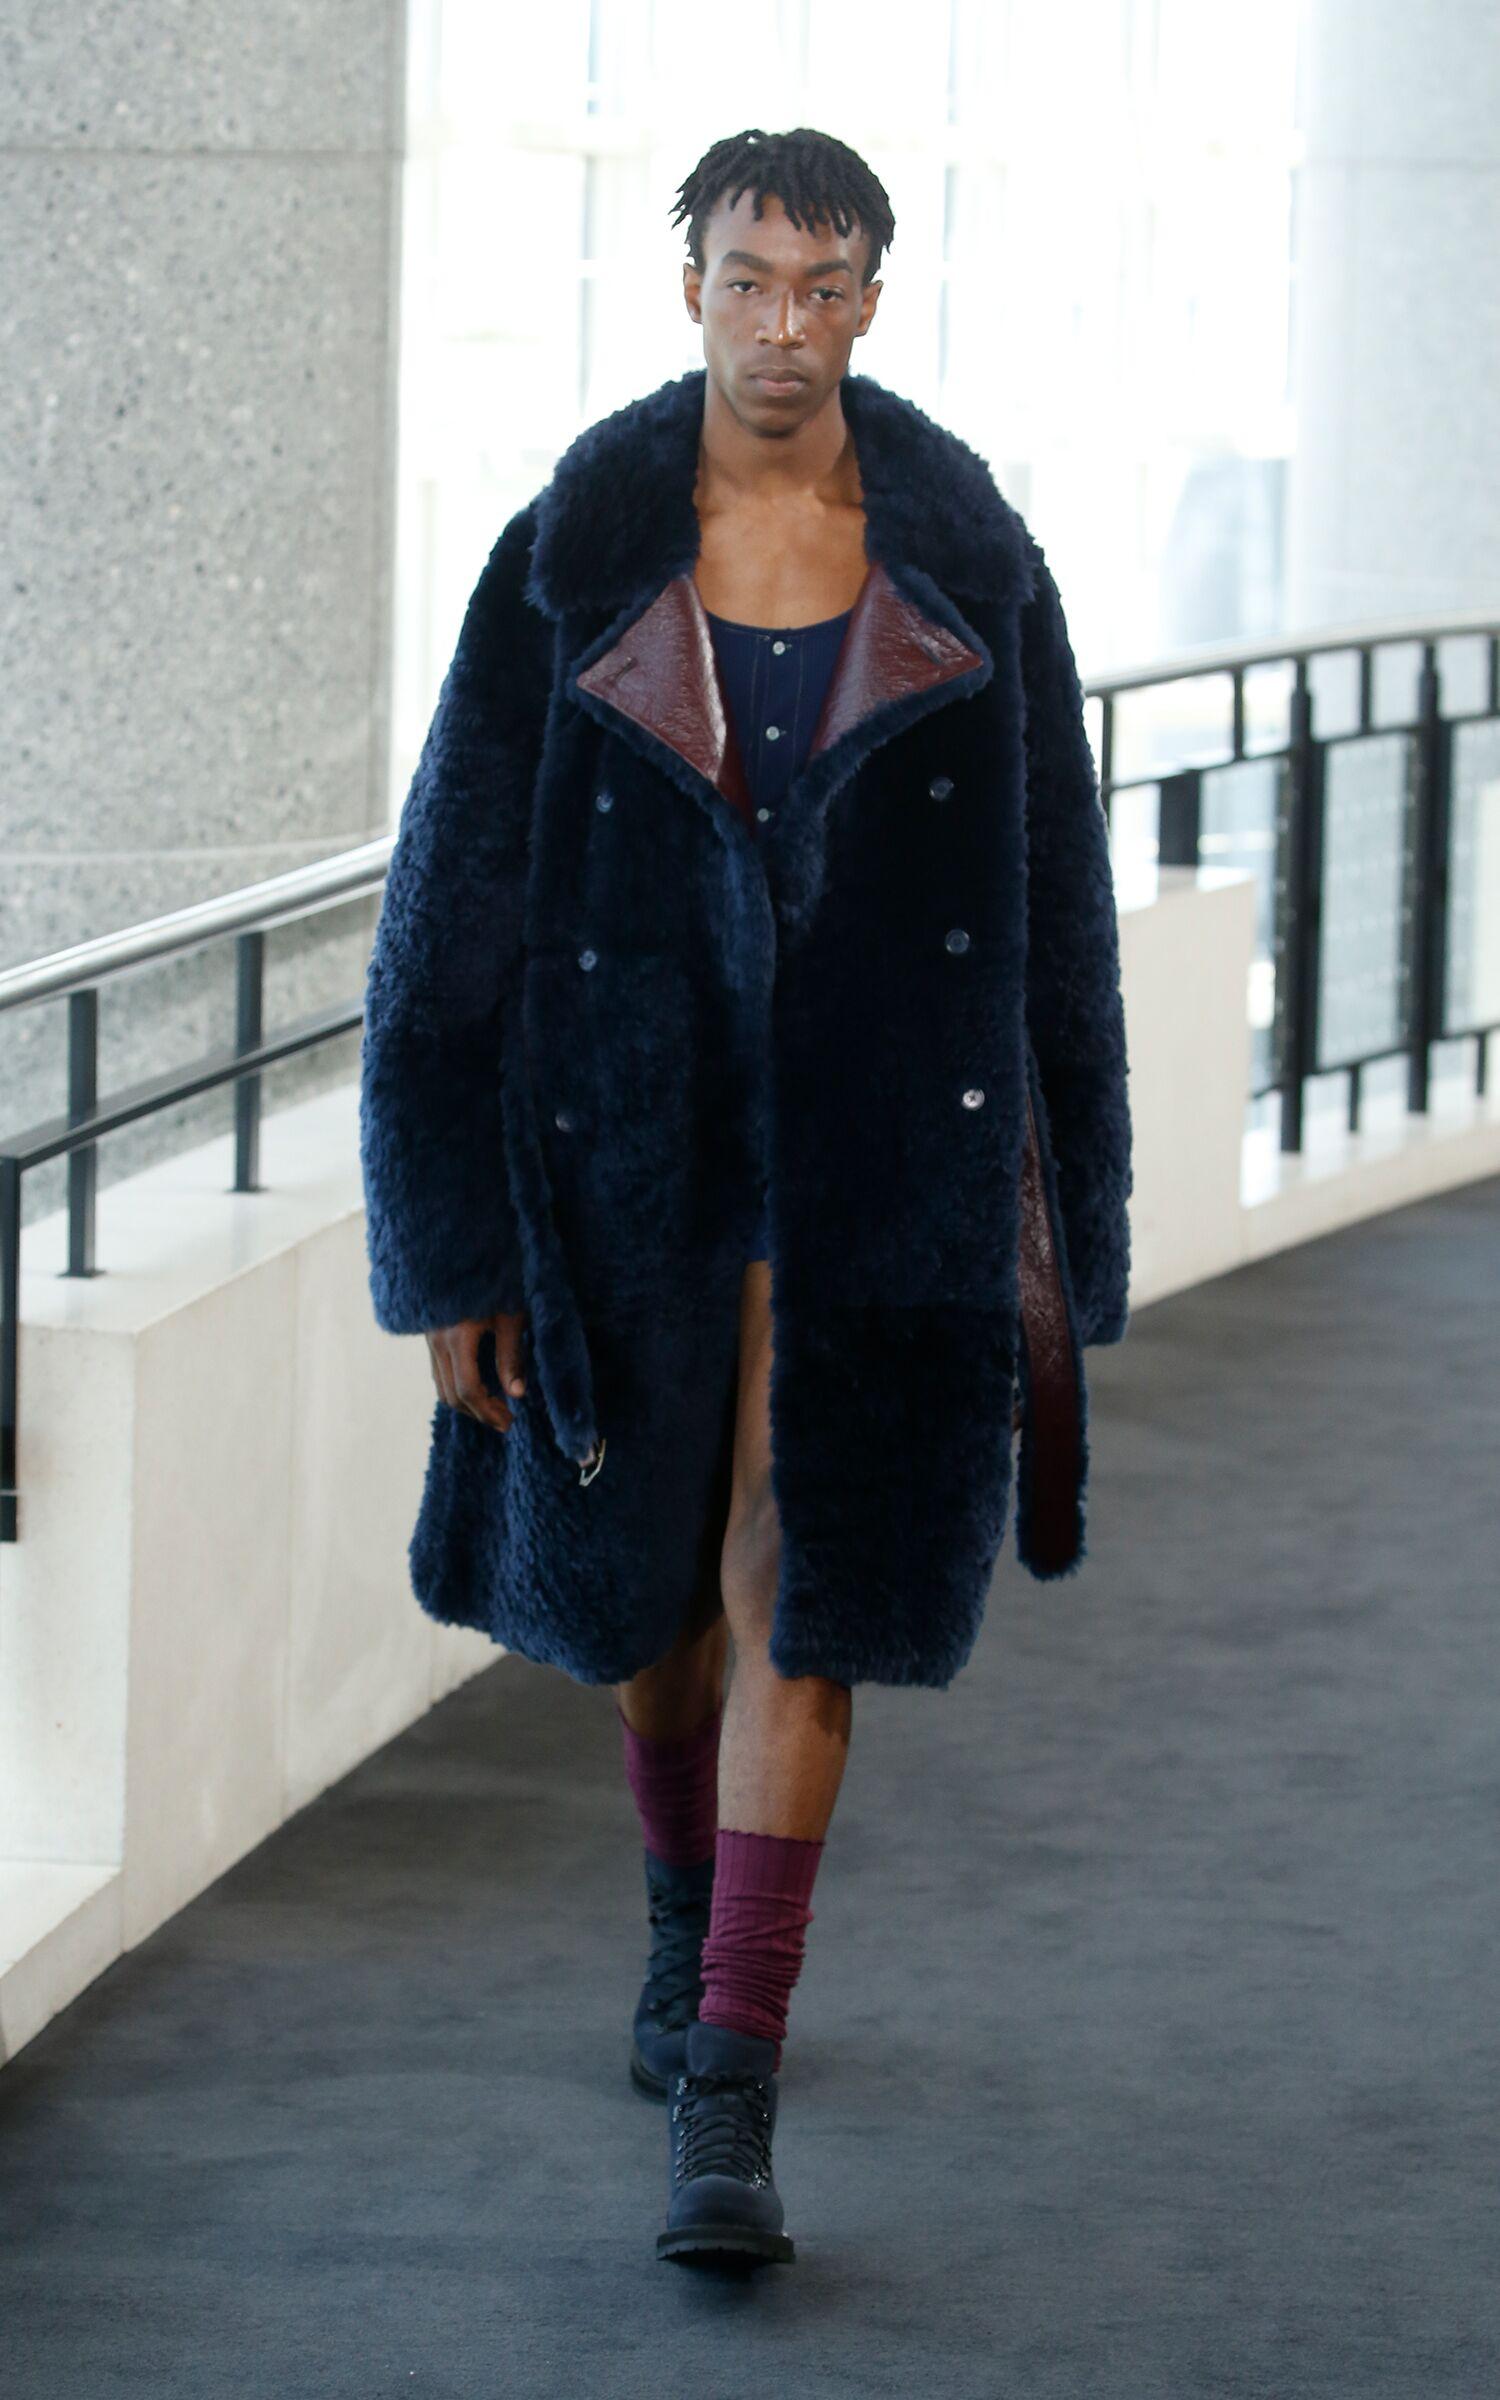 Catwalk Sies Marjan Man Fashion Show Summer 2020